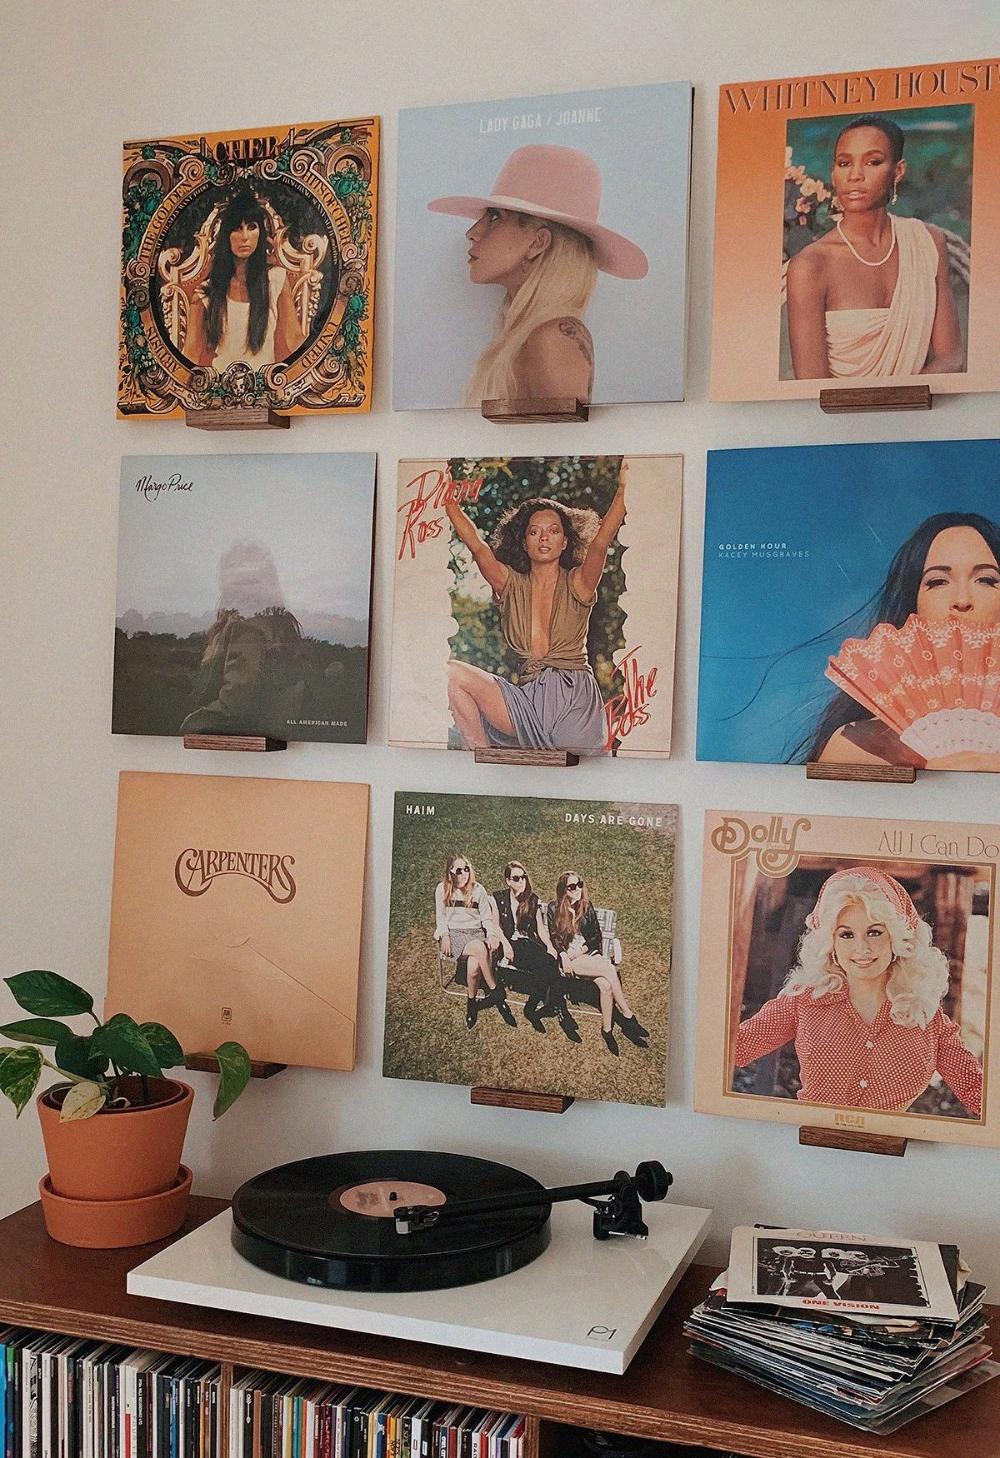 , The Vinyl Wall Panels | Wood Record Display Shelves, Family Blog 2020, Family Blog 2020